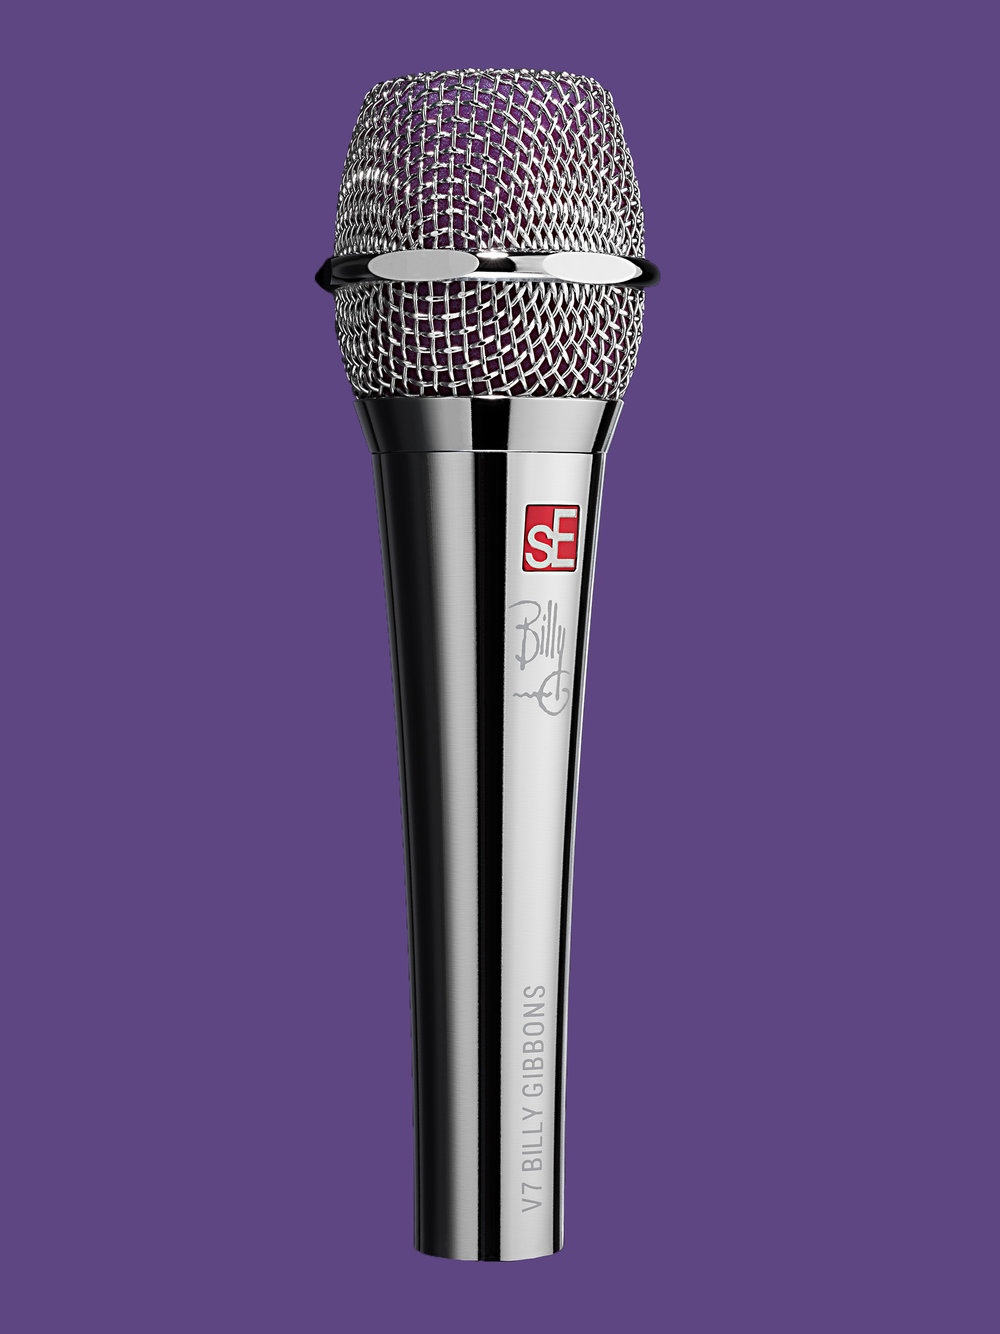 purple-bfg-slider4.jpg